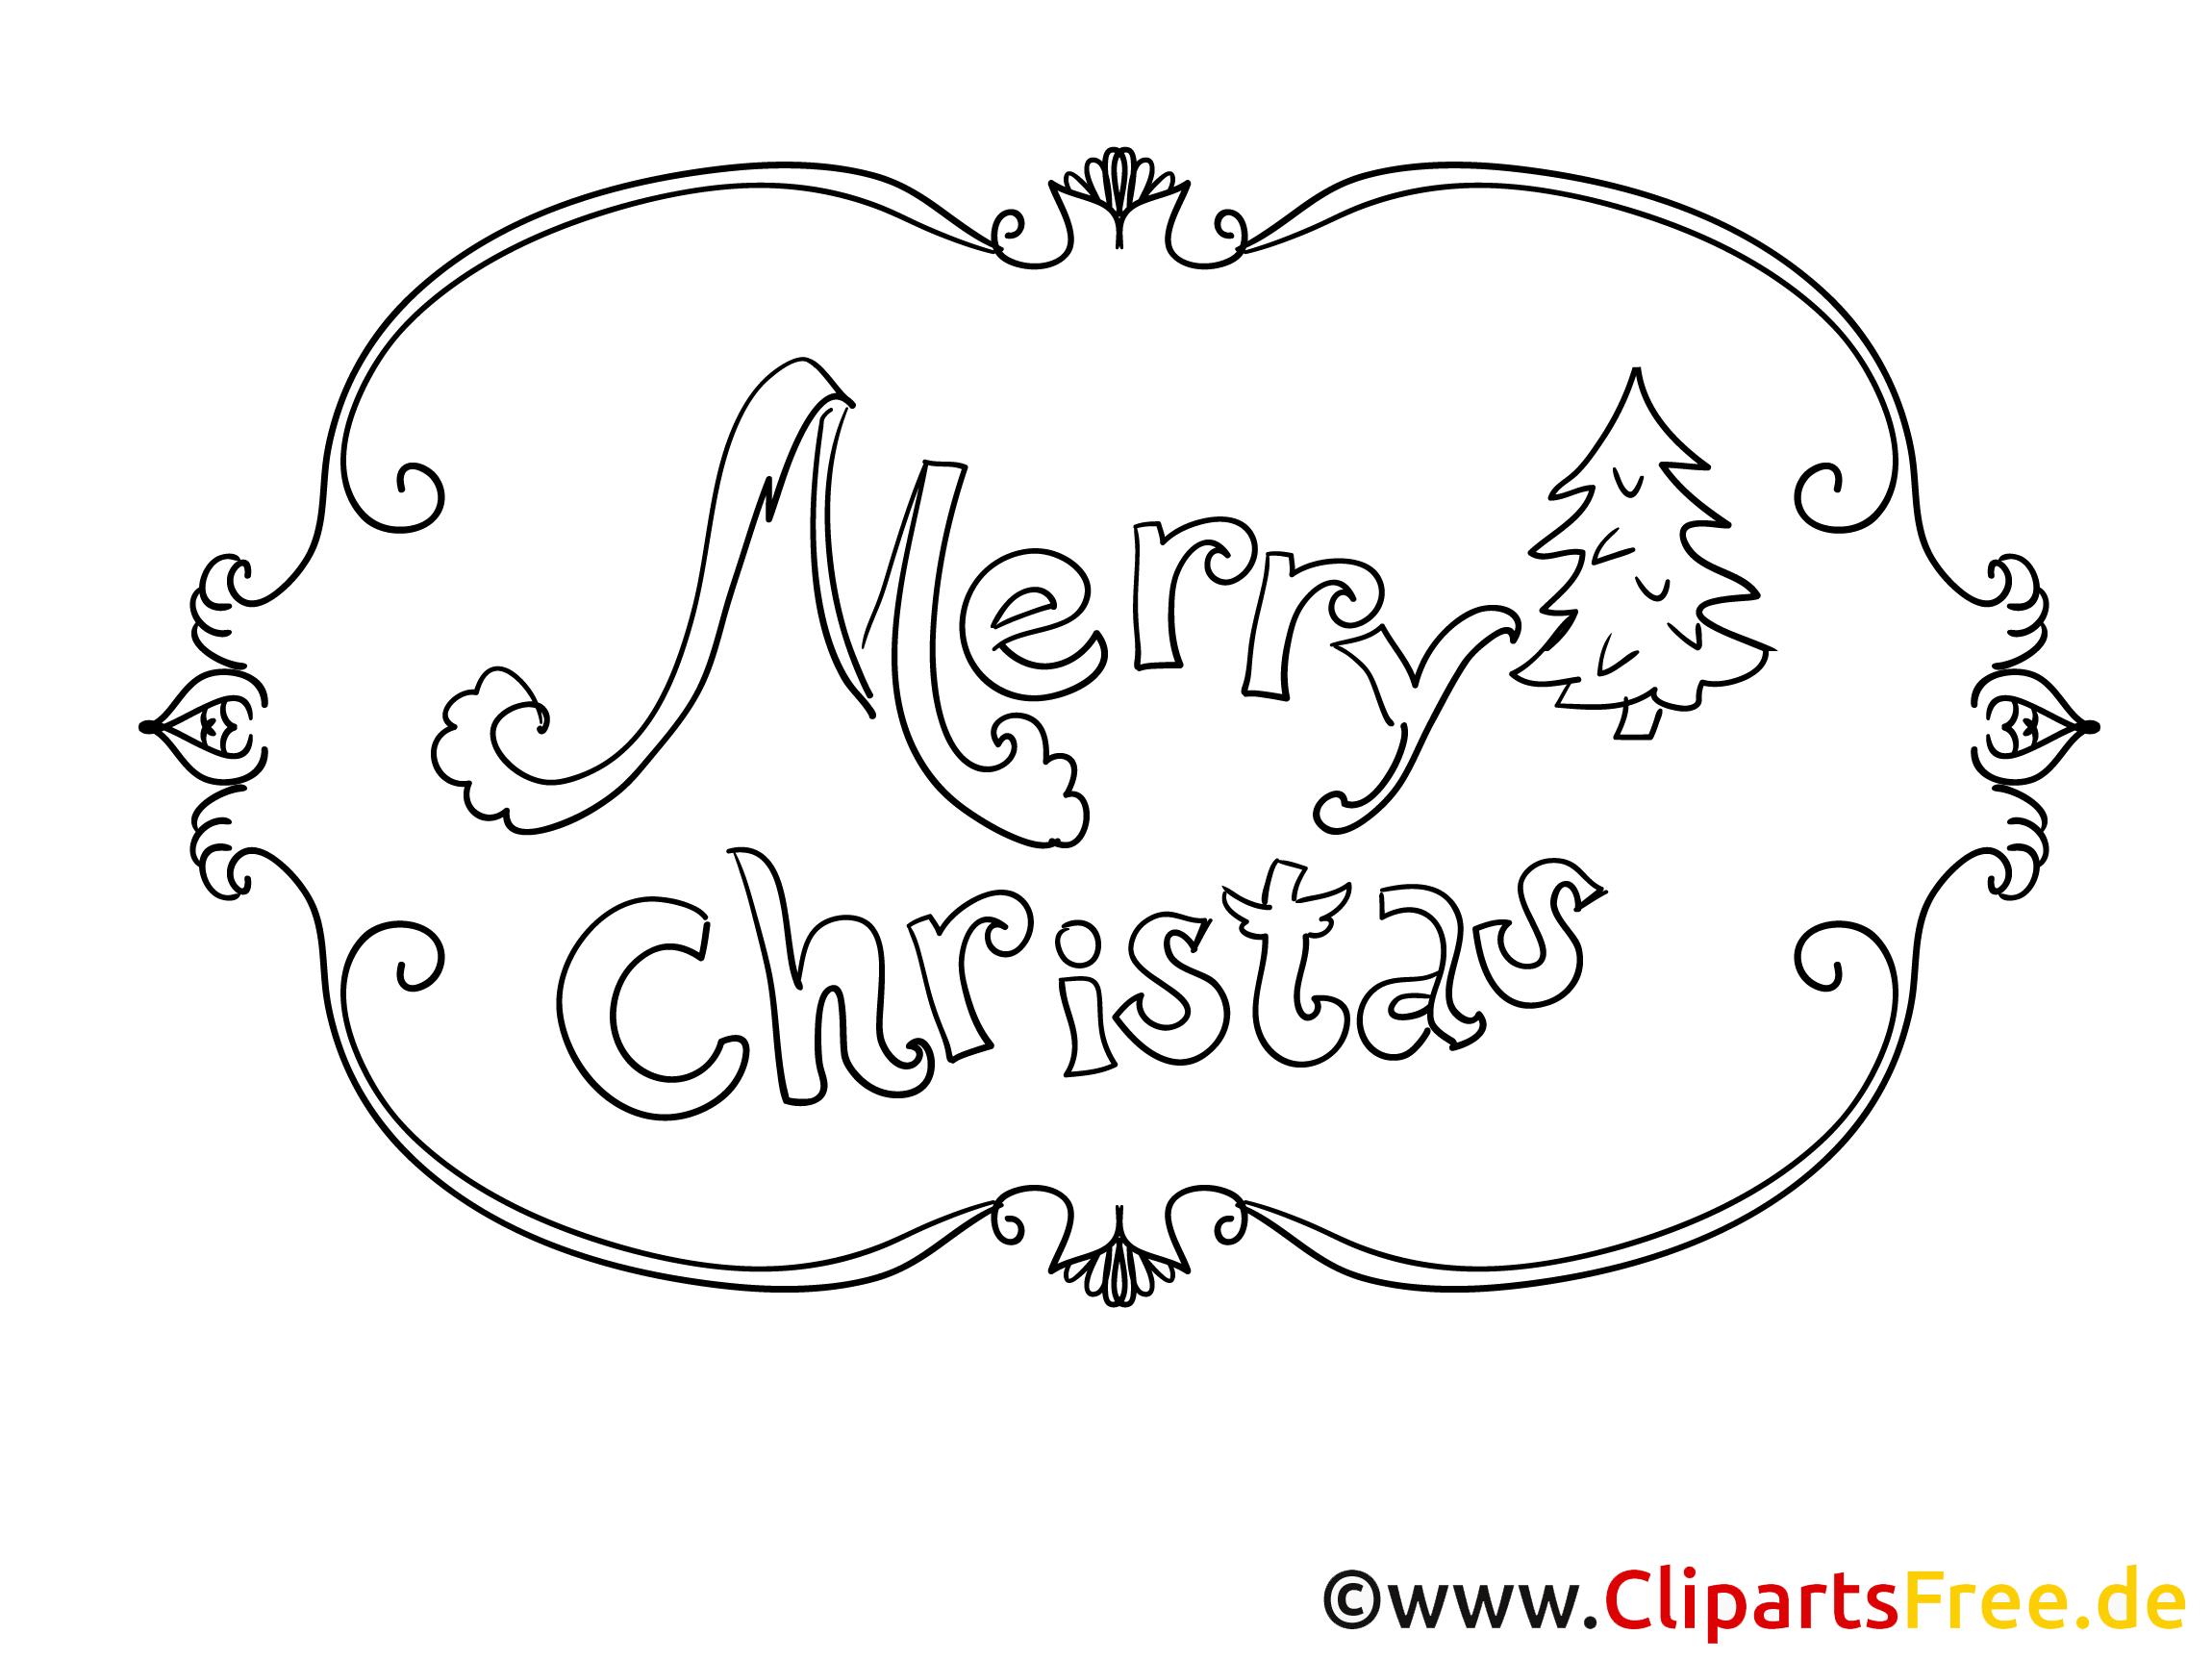 Malvorlagen Merry Christmas  Coloring and Malvorlagan